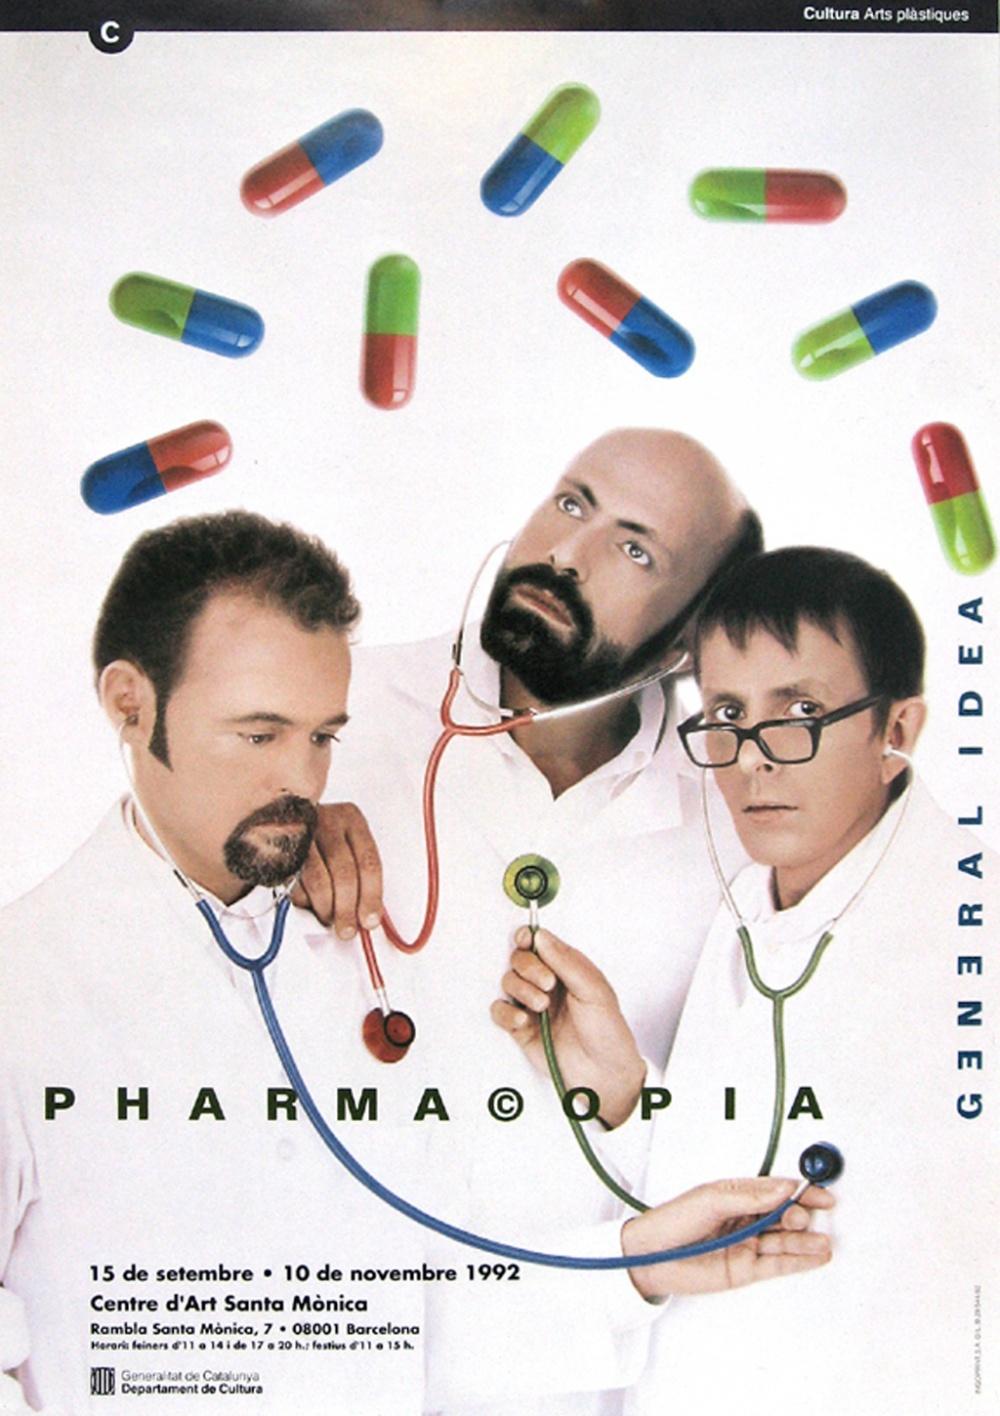 General Idea Pharma©opia (Barcelona) exhibition poster